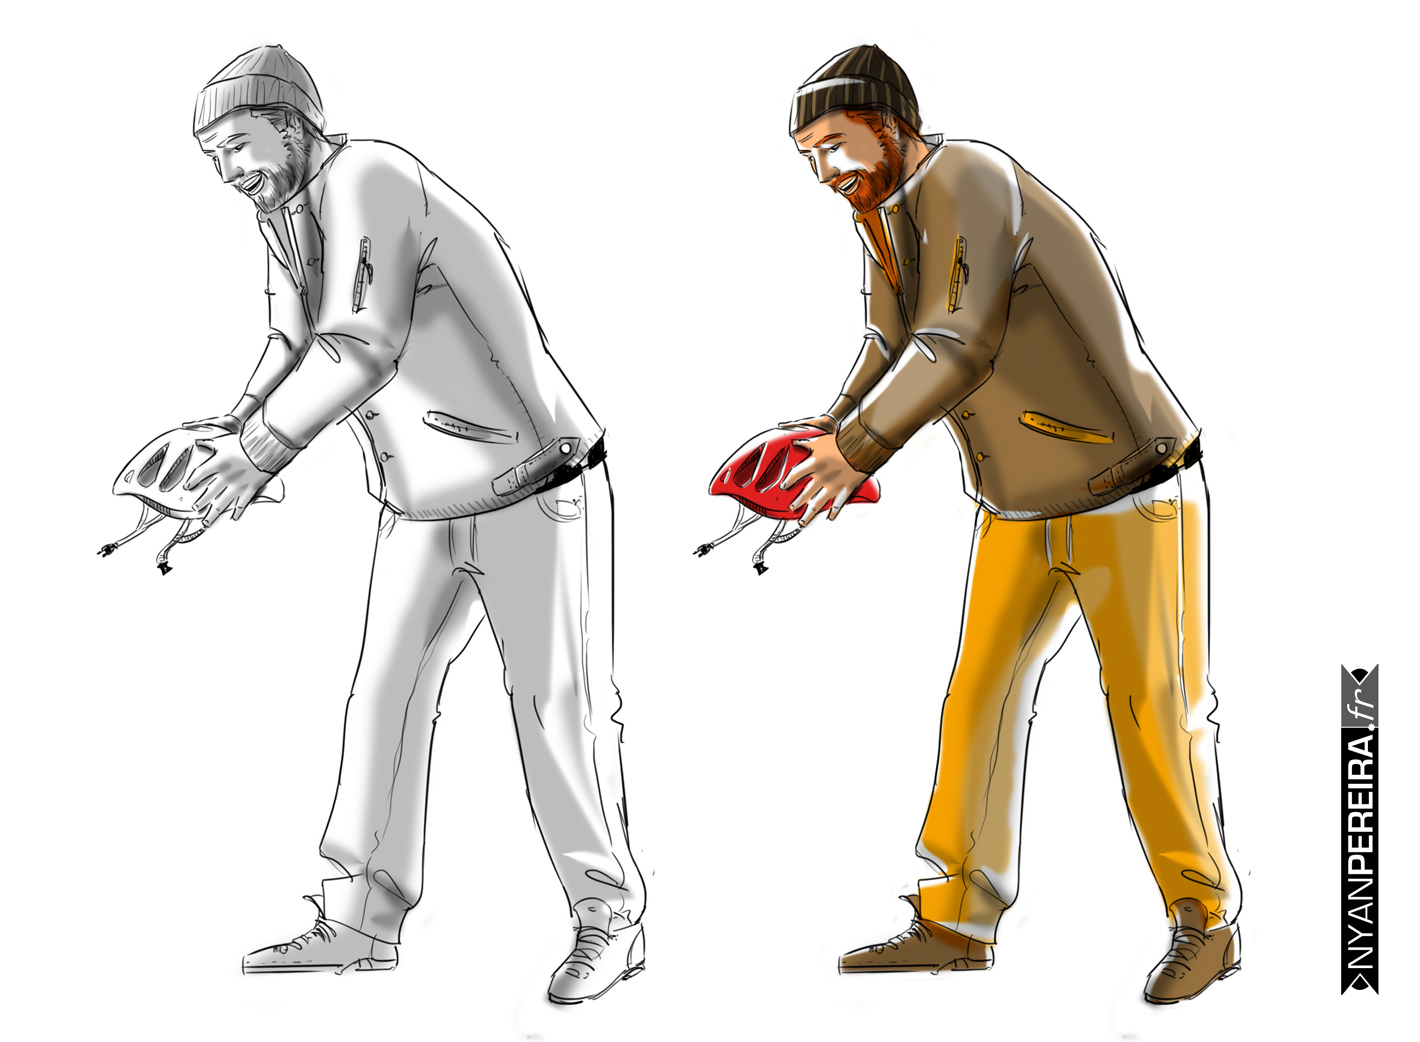 evolution.dessin.publicite;roughman